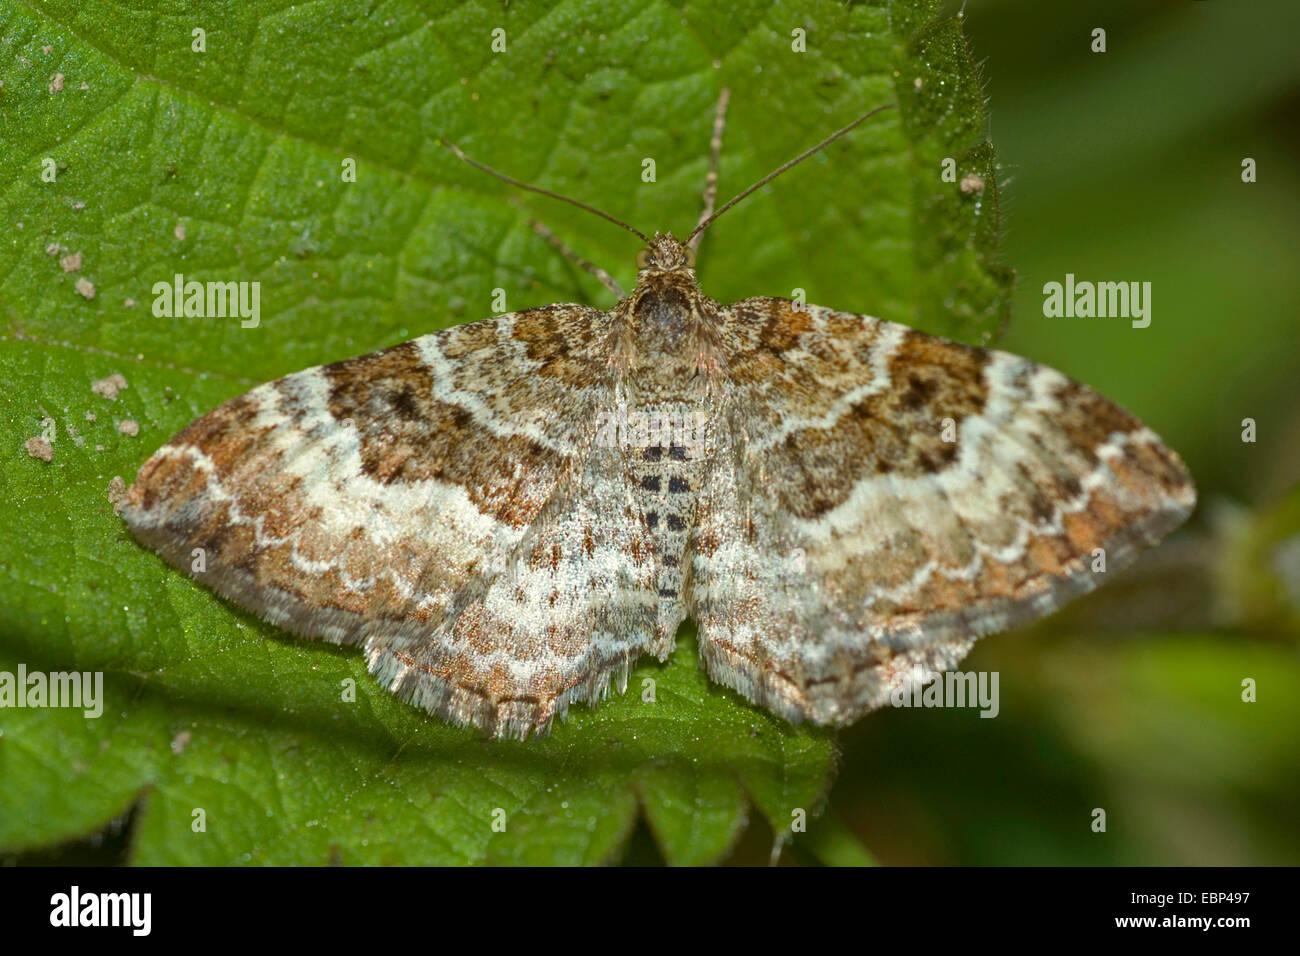 Common Carpet (Epirrhoe alternata), on a leaf, Germany - Stock Image